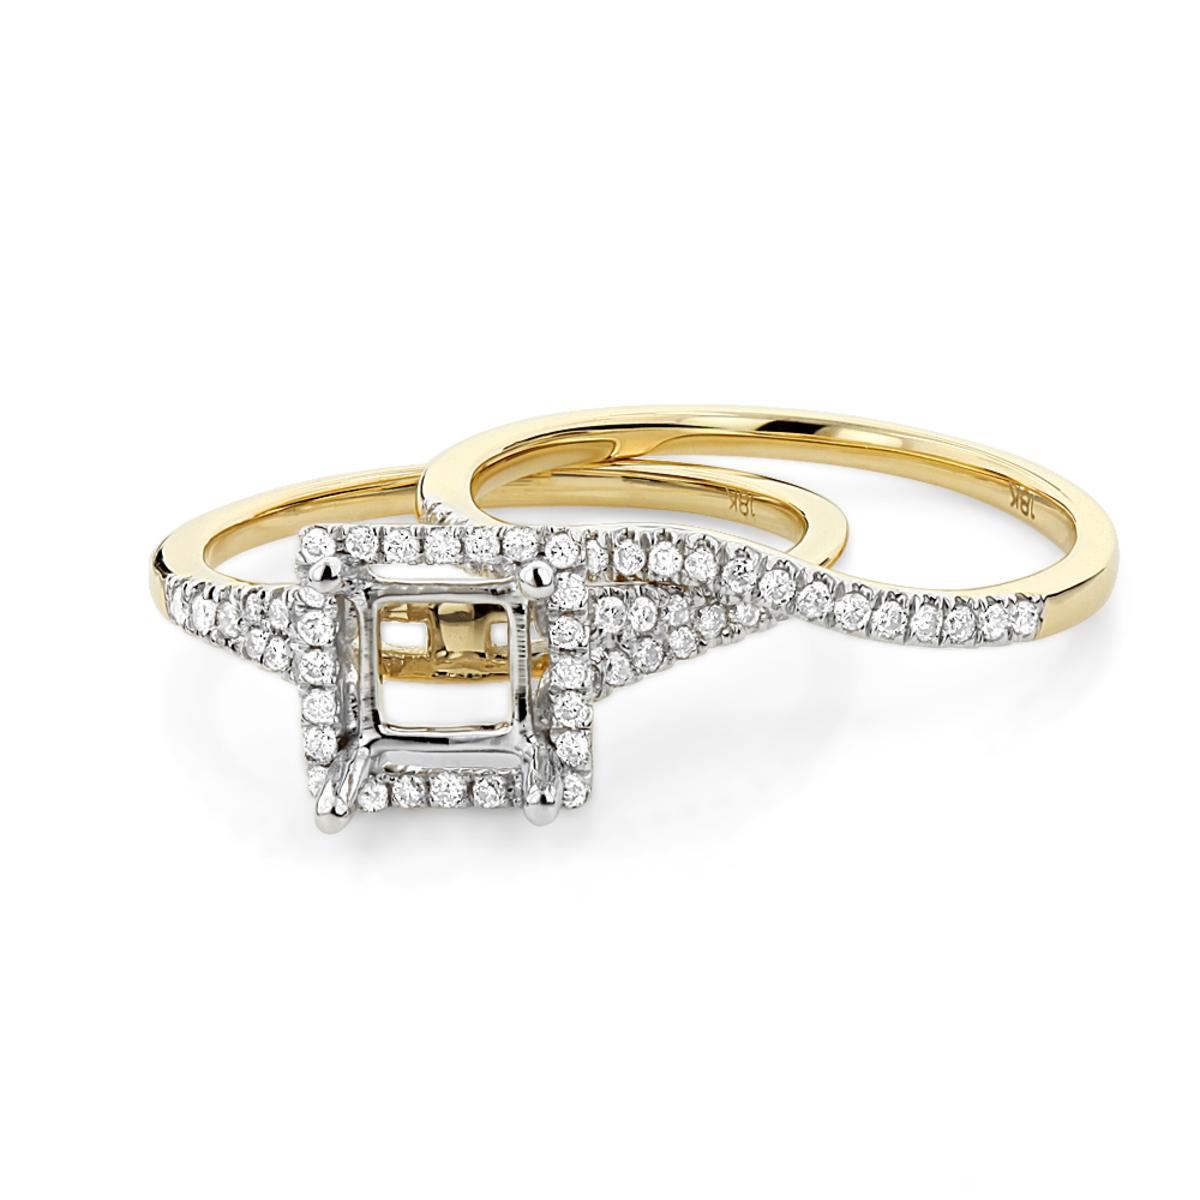 Halo 18K Gold Princess Cut Diamond Engagement Ring Mounting Set 0.48ct